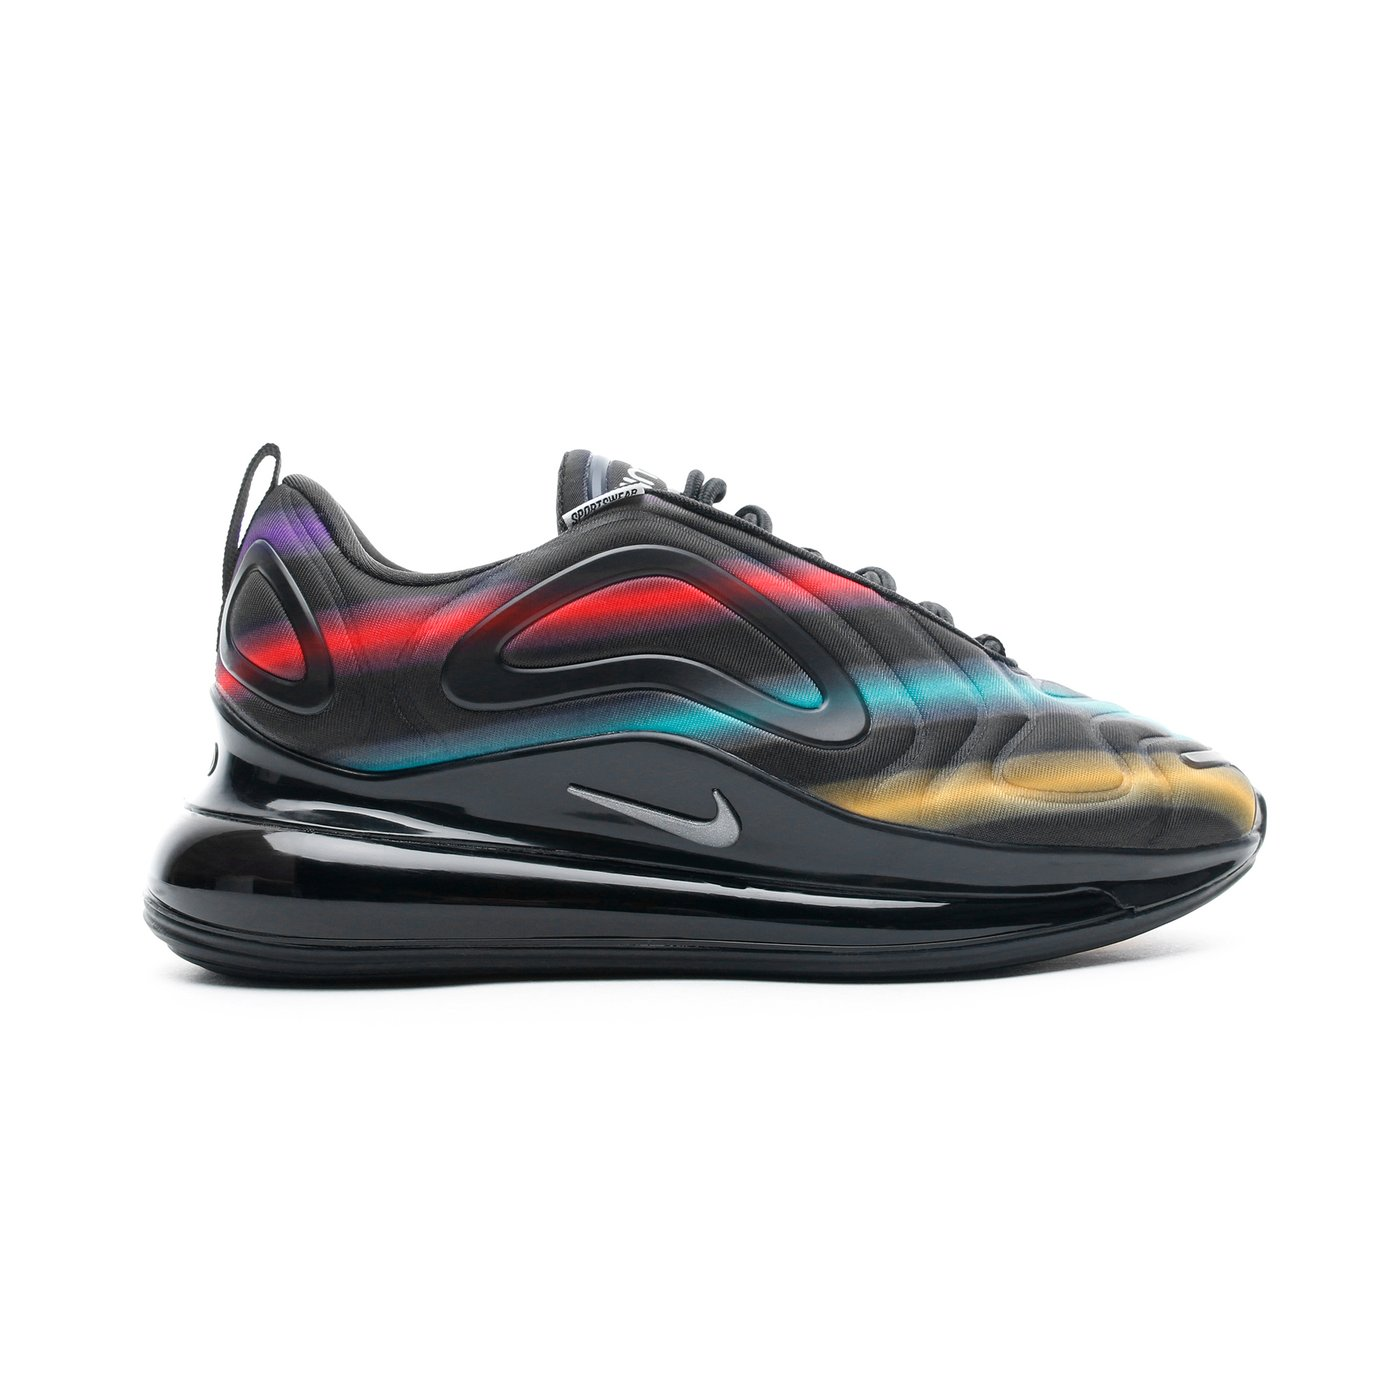 Nike Air Max 720 Siyah Unisex Spor Ayakkabı